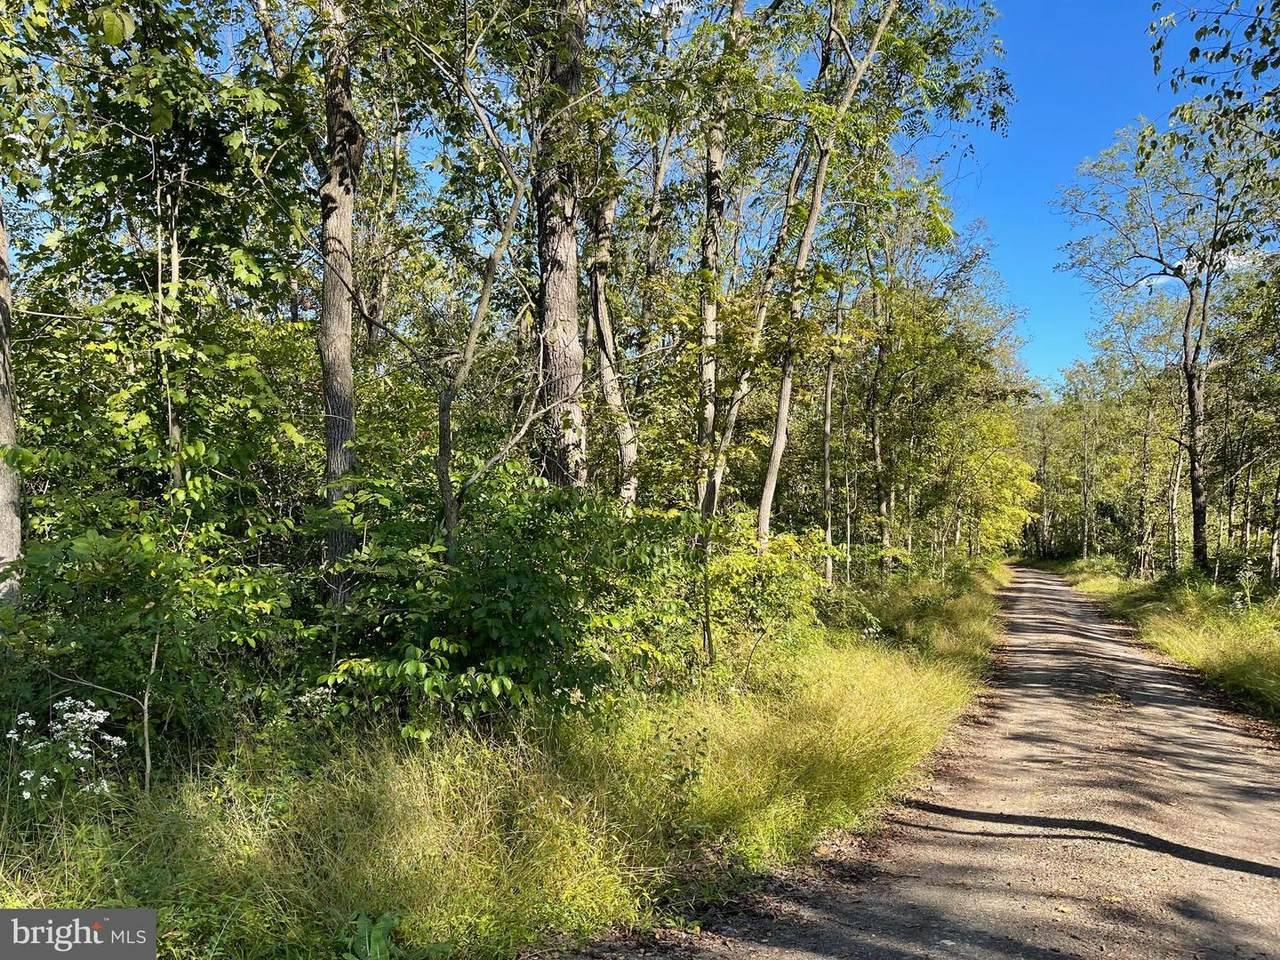 0 Lot 1 & 2 Blue Spruce Lane - Photo 1